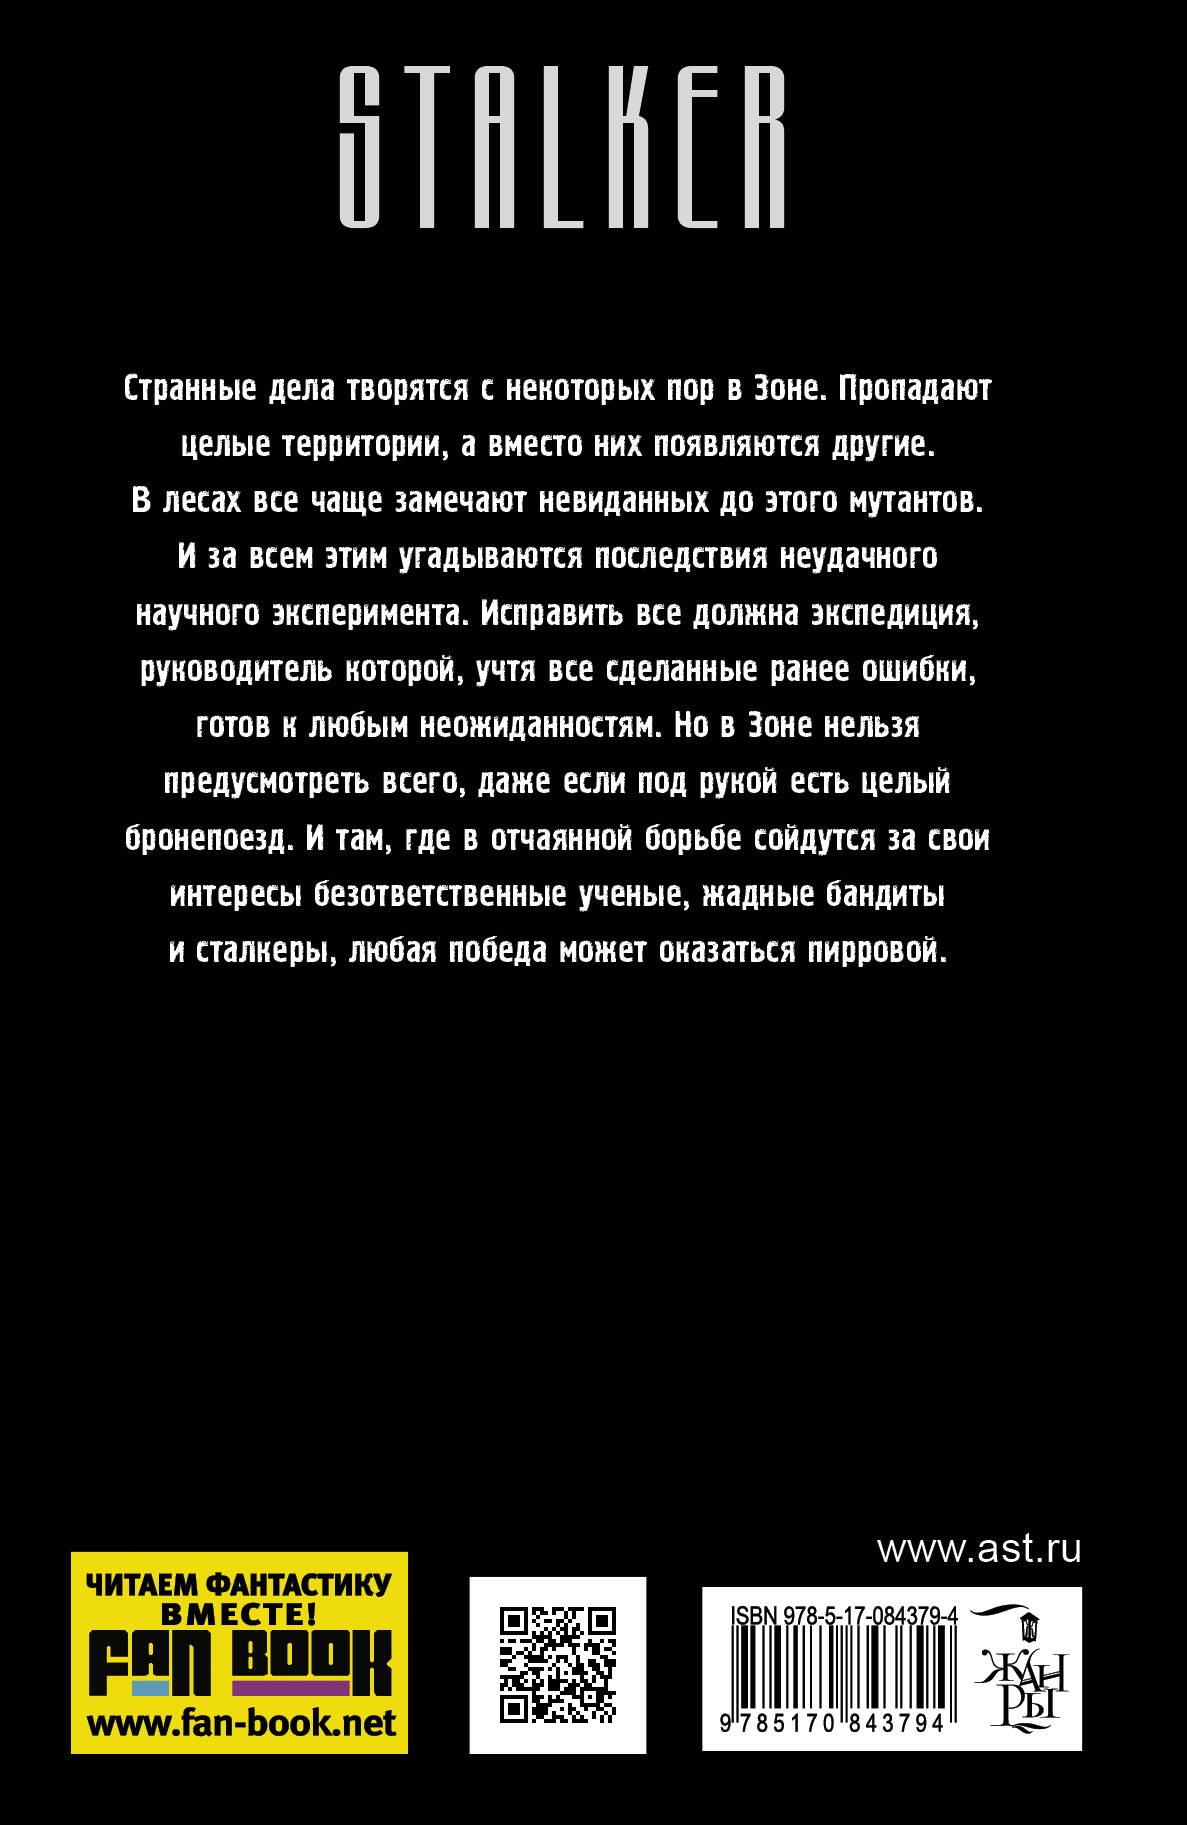 Книга Легенды Зоны. В петле